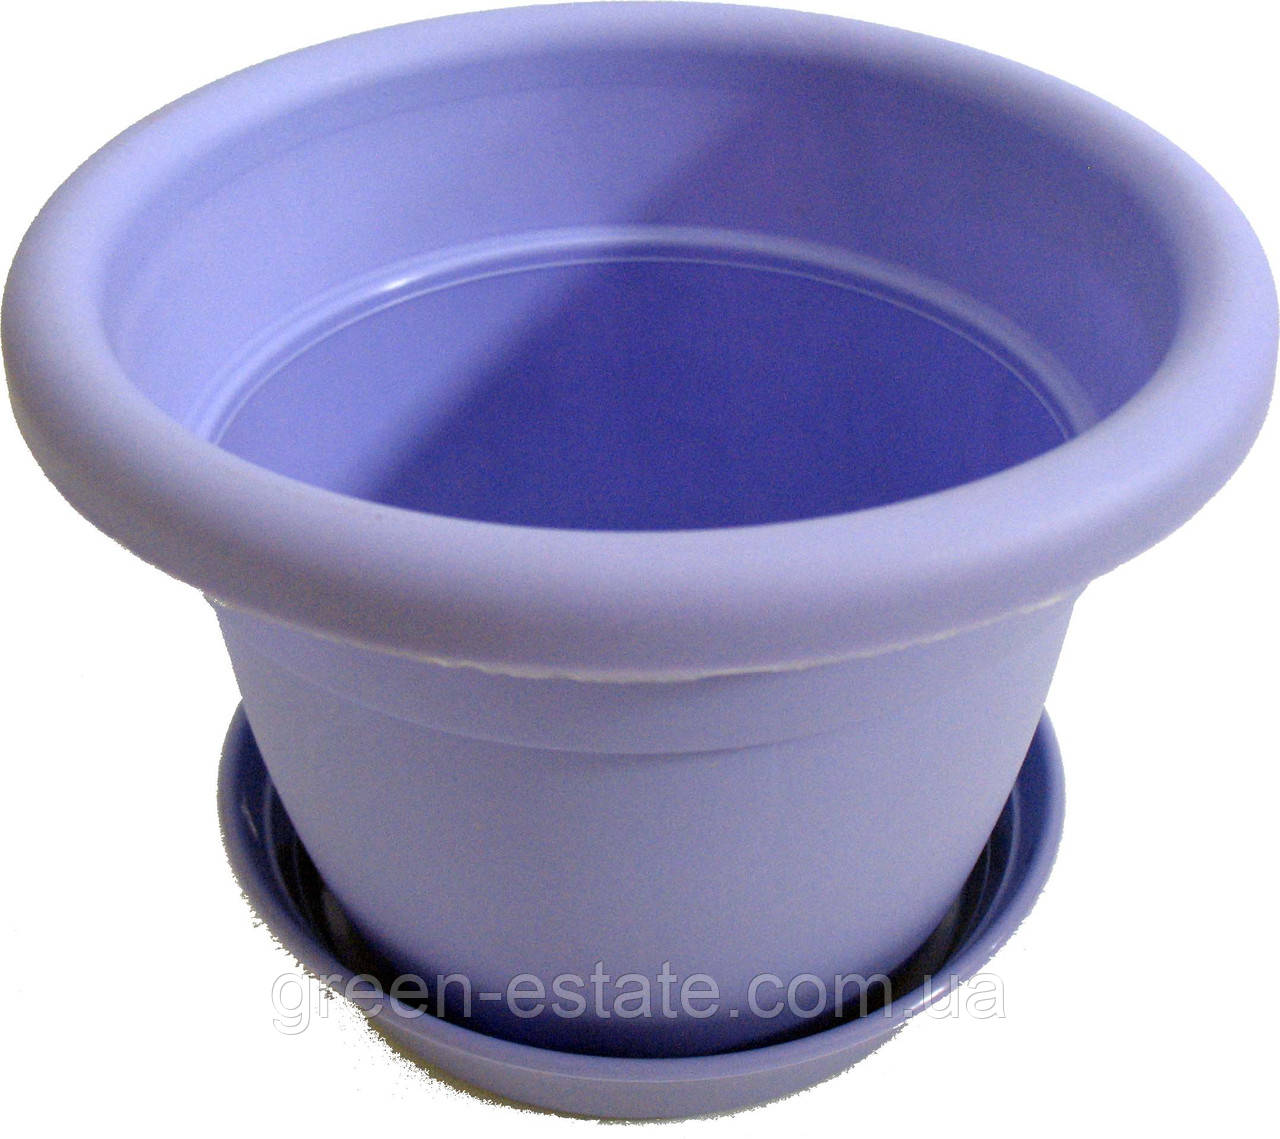 Вазон Антик 18 2,85 л сирень